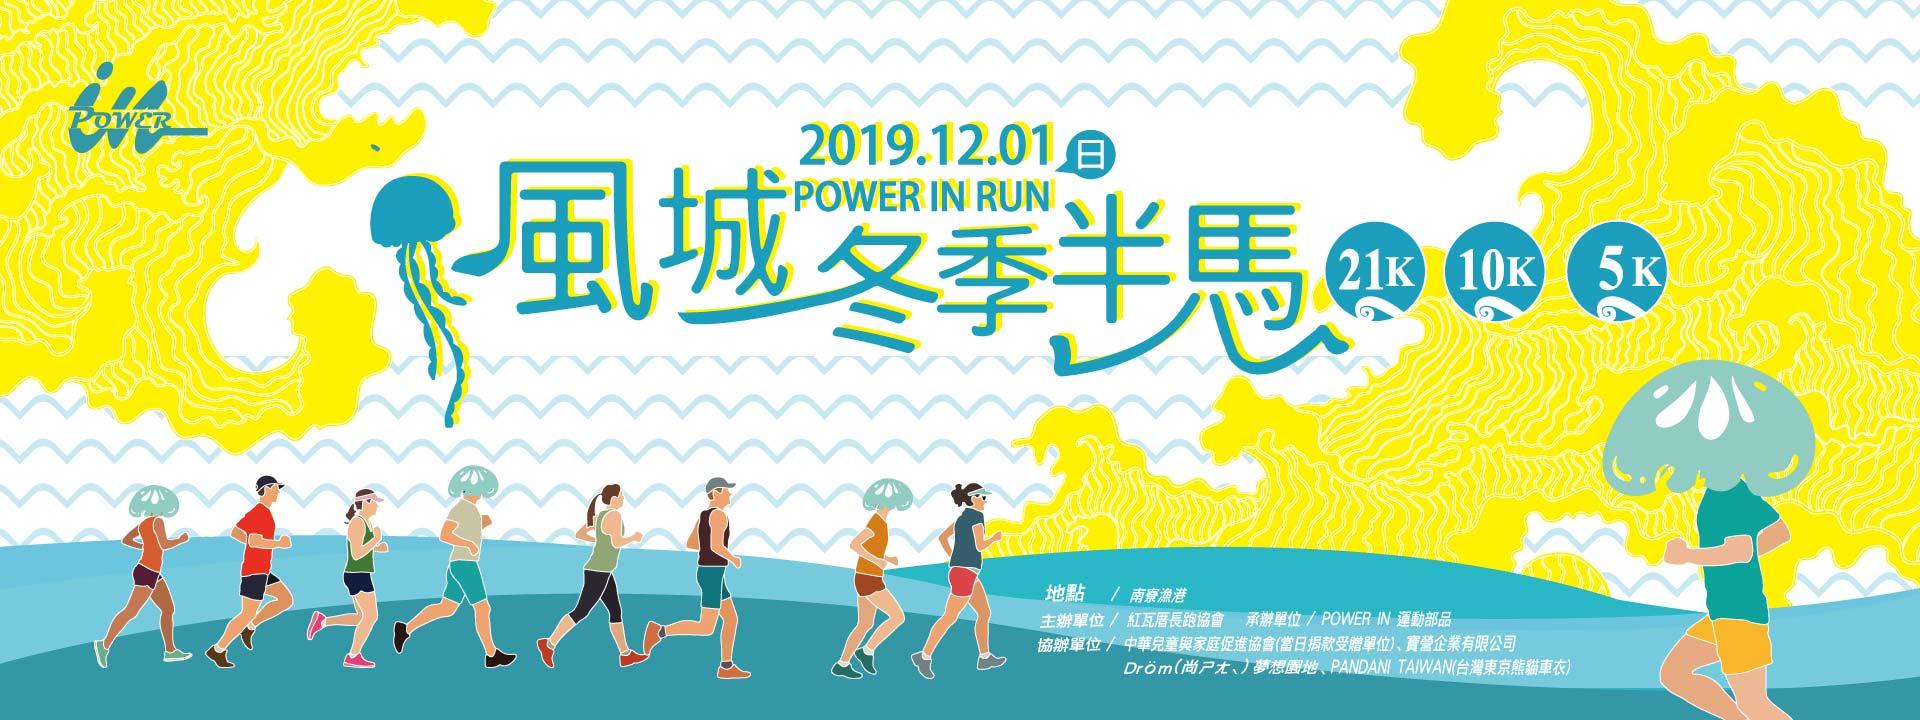 2019 POWER IN RUN 風城冬季半馬